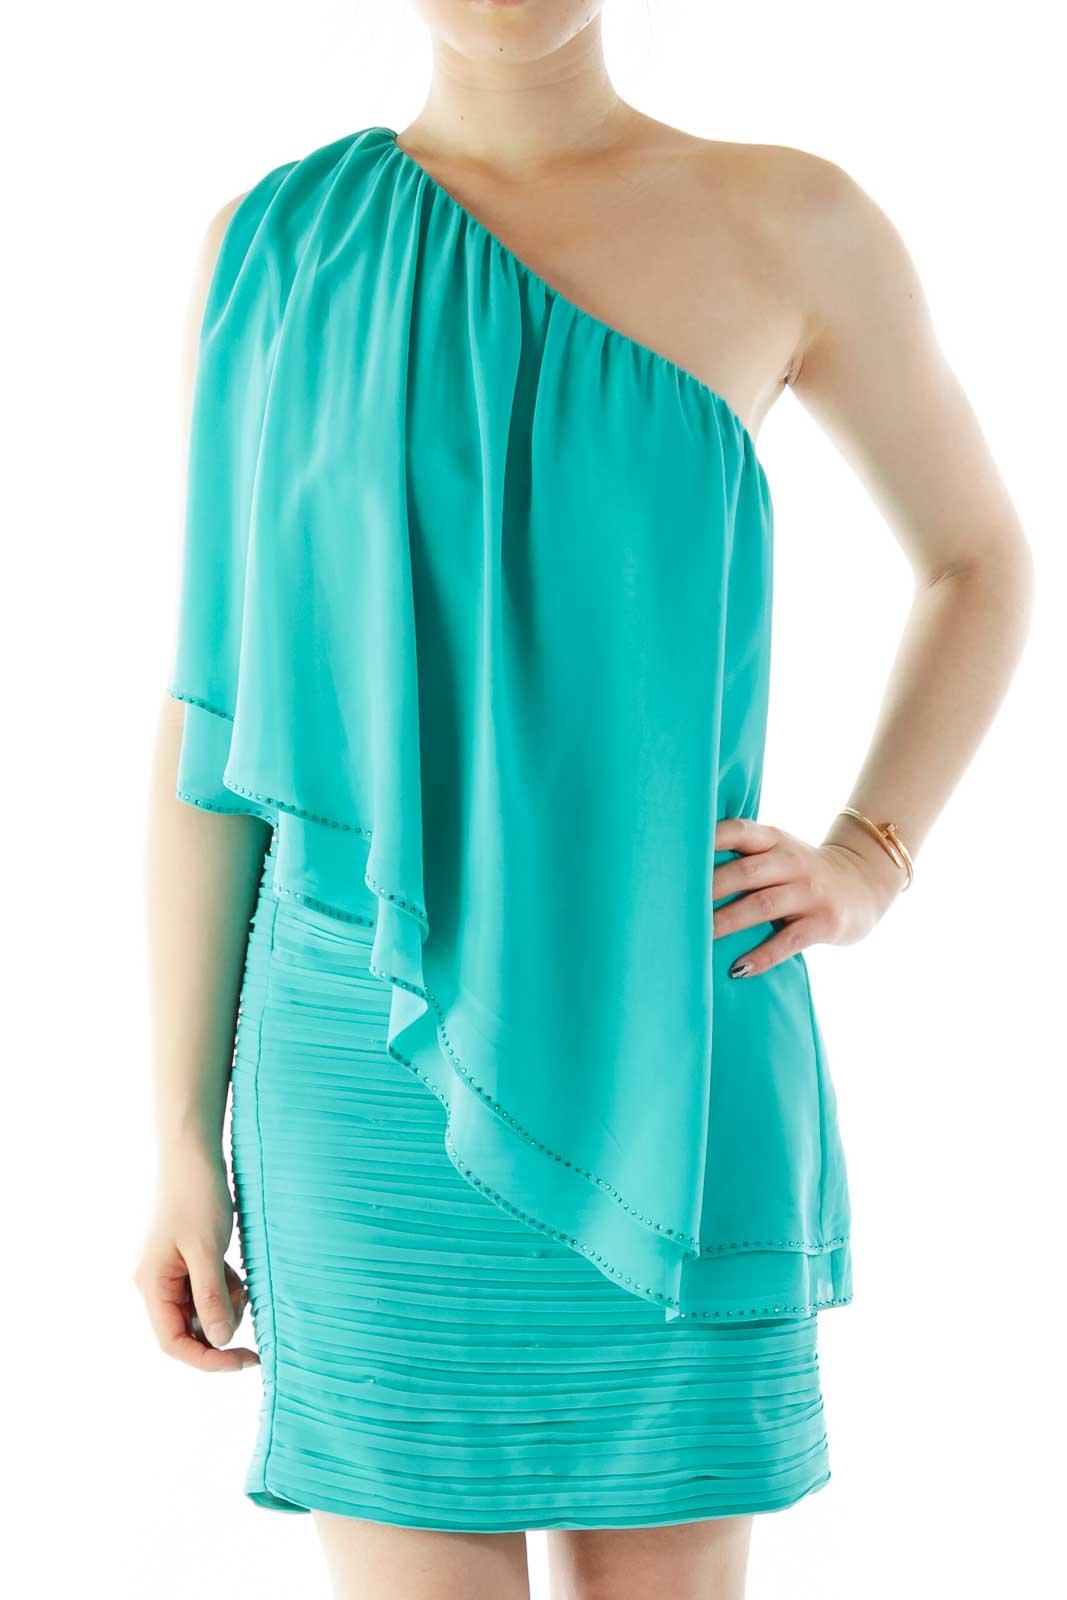 Turquoise Crêpe One-Shoulder Cocktail Dress Front